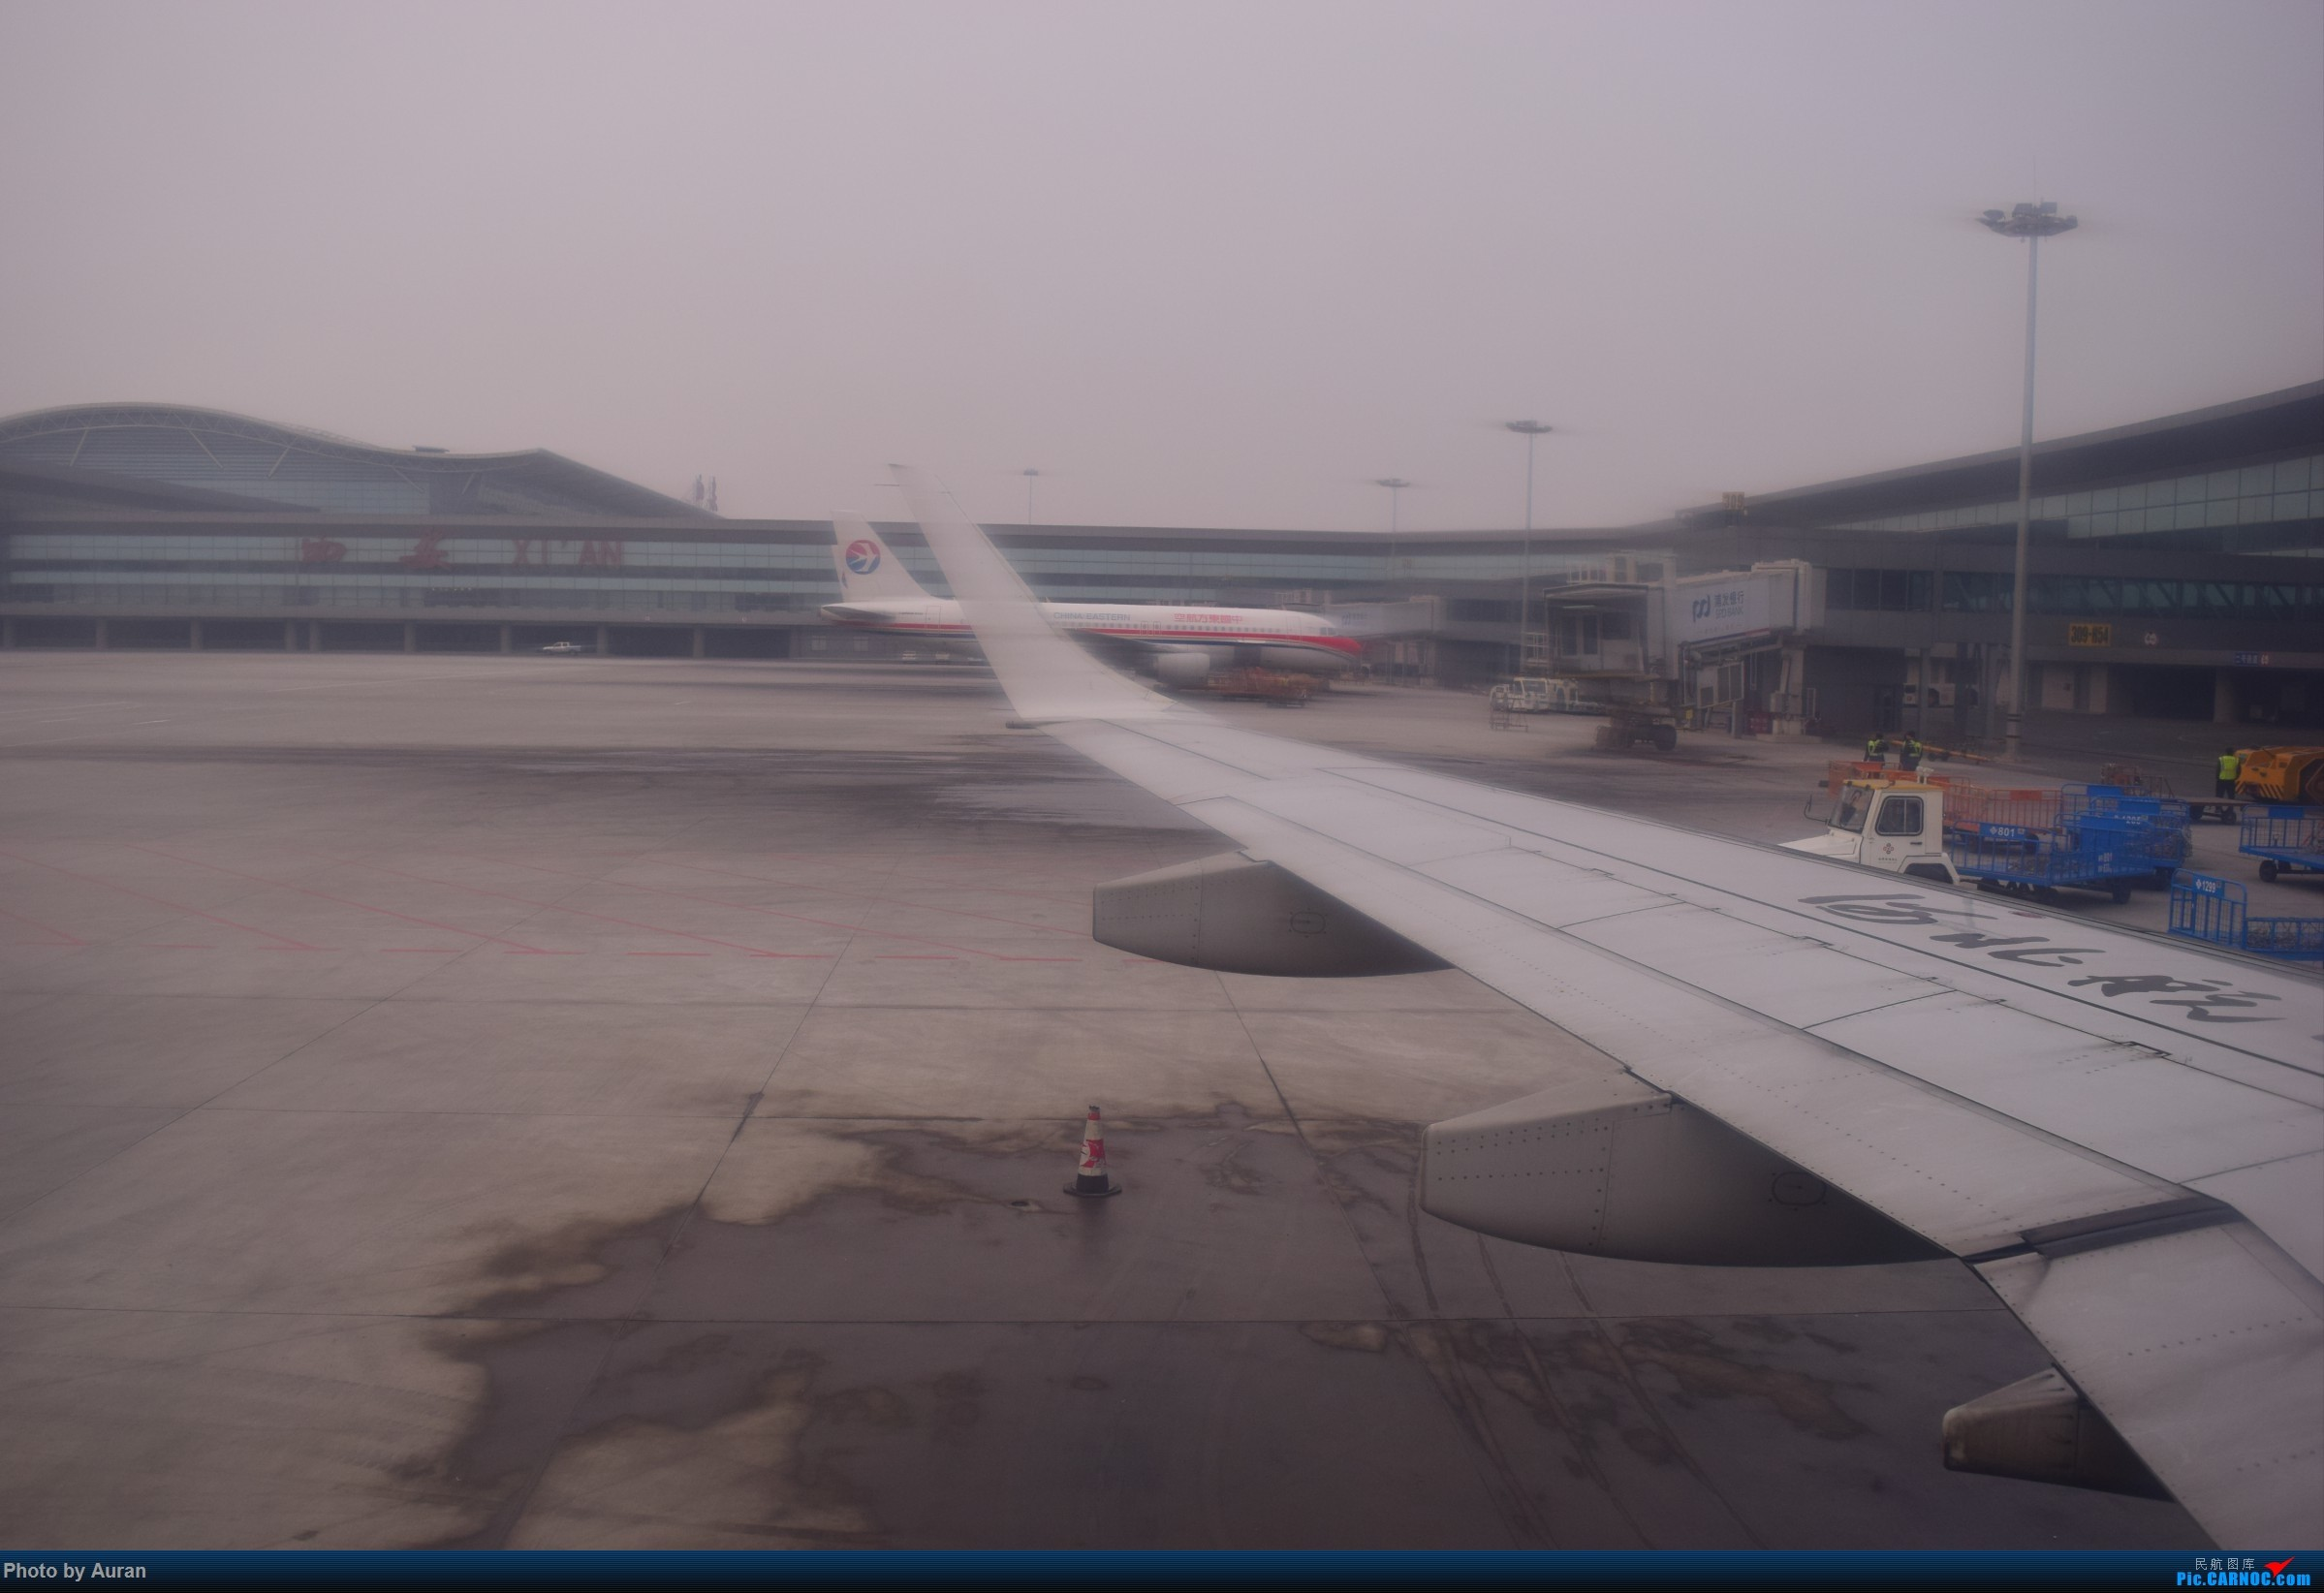 Re:[原创]【Auran游记2】陇秦之旅 E190 B-3207